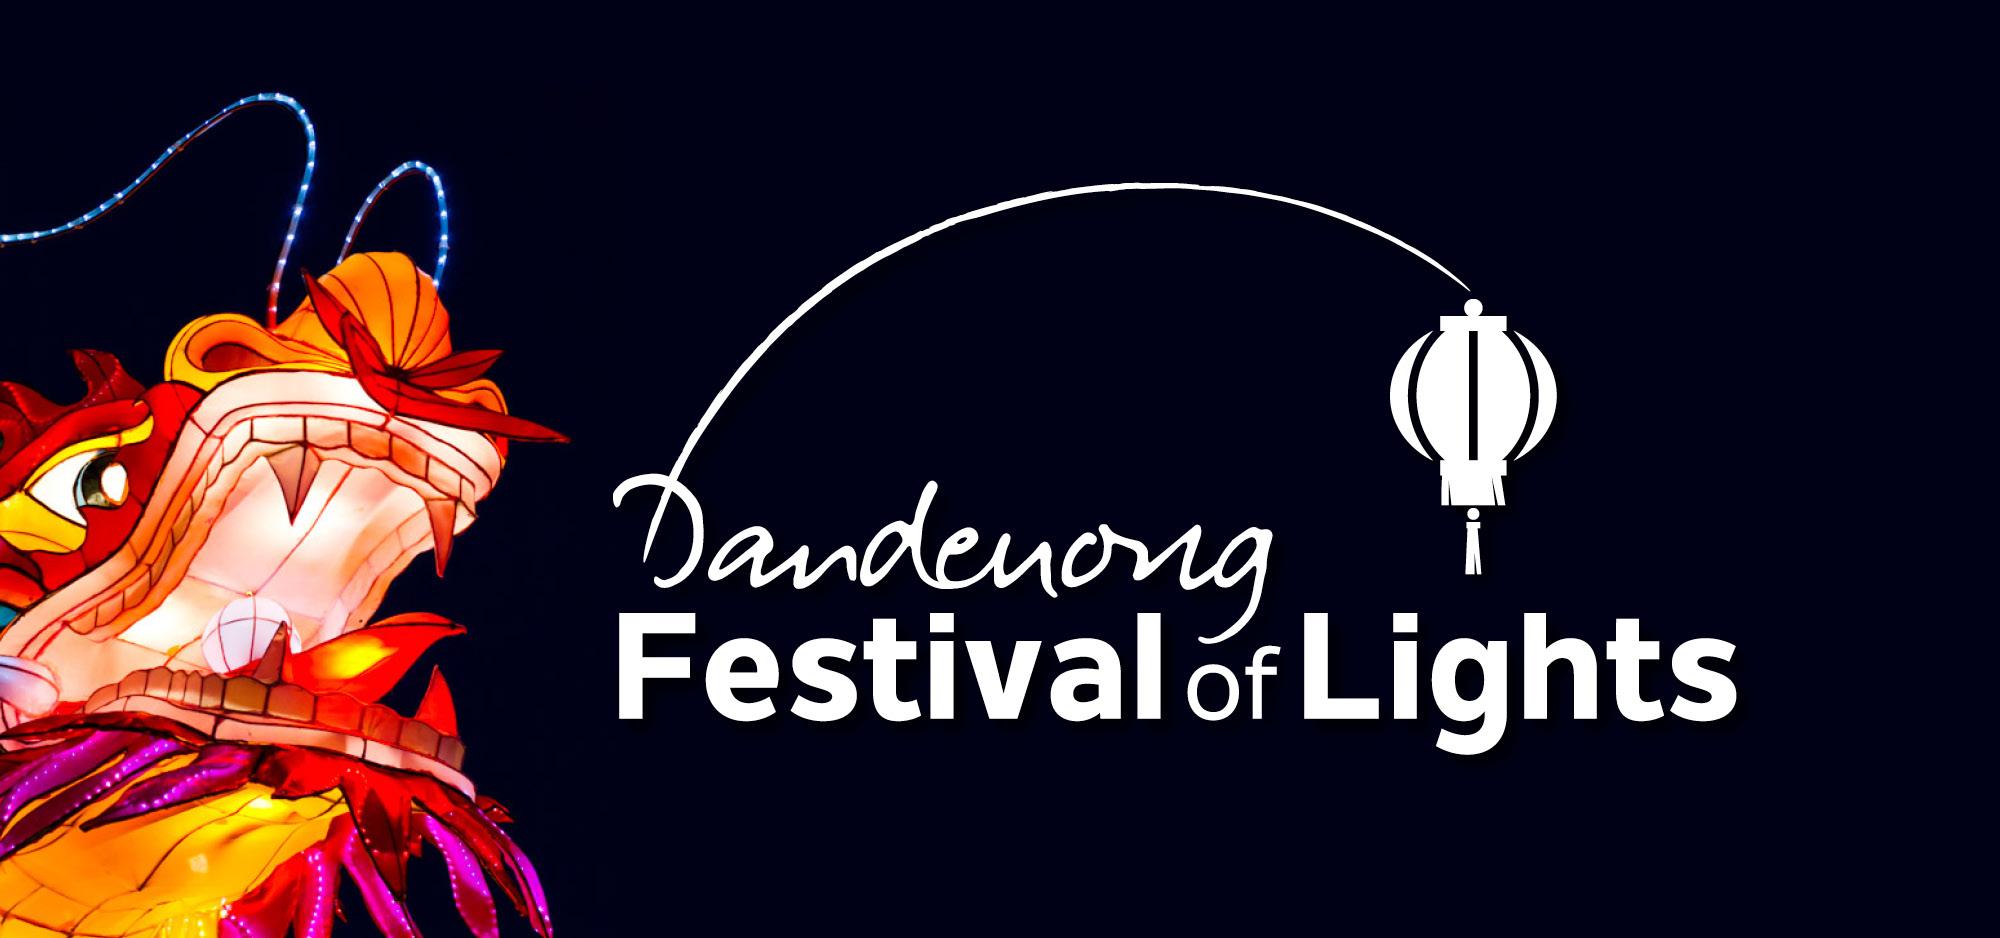 logo_design_mornington_dandenong_light_festival